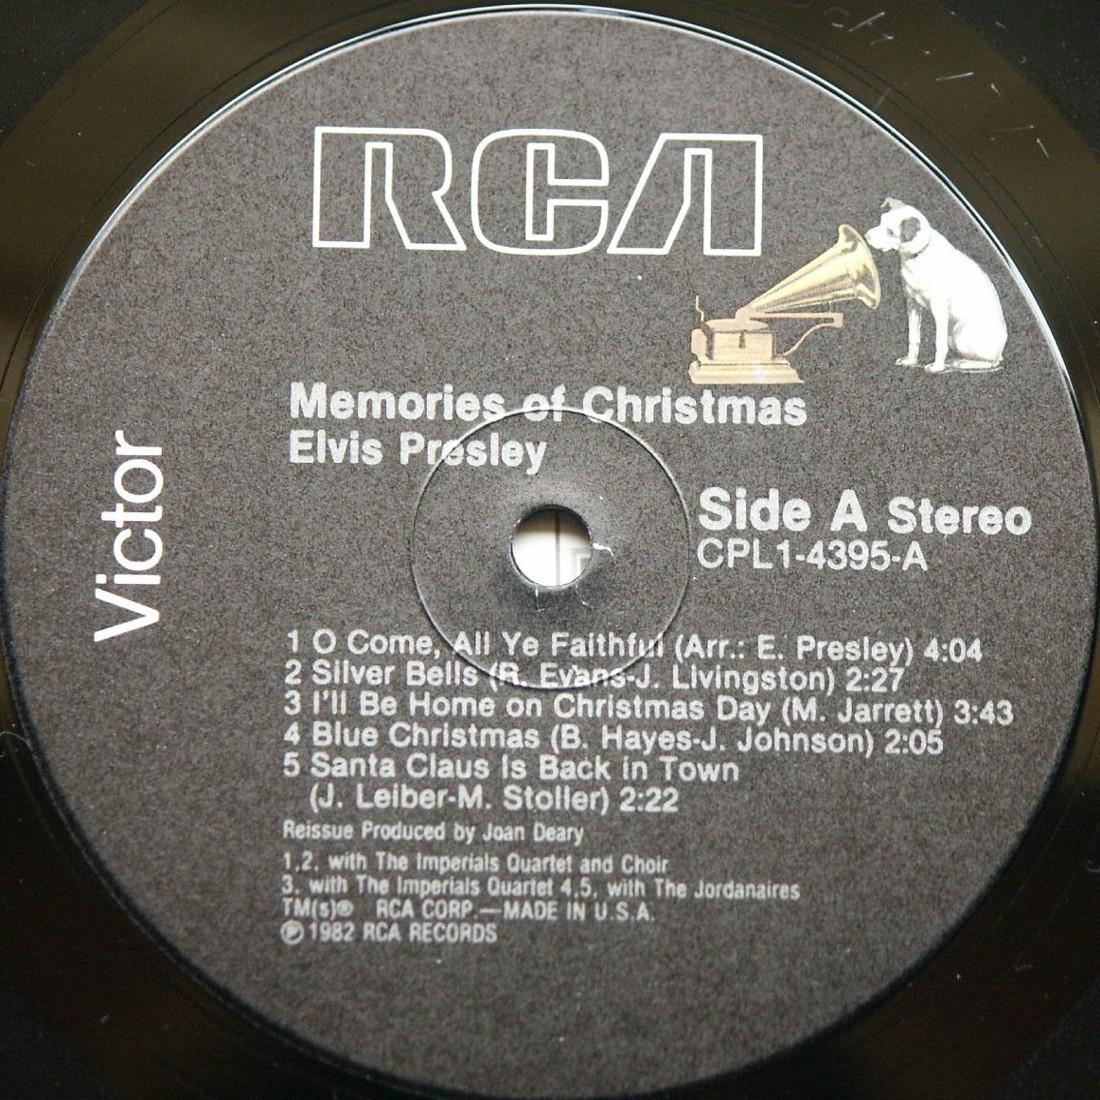 MEMORIES OF CHRISTMAS Cpl1-4395ezoqxa